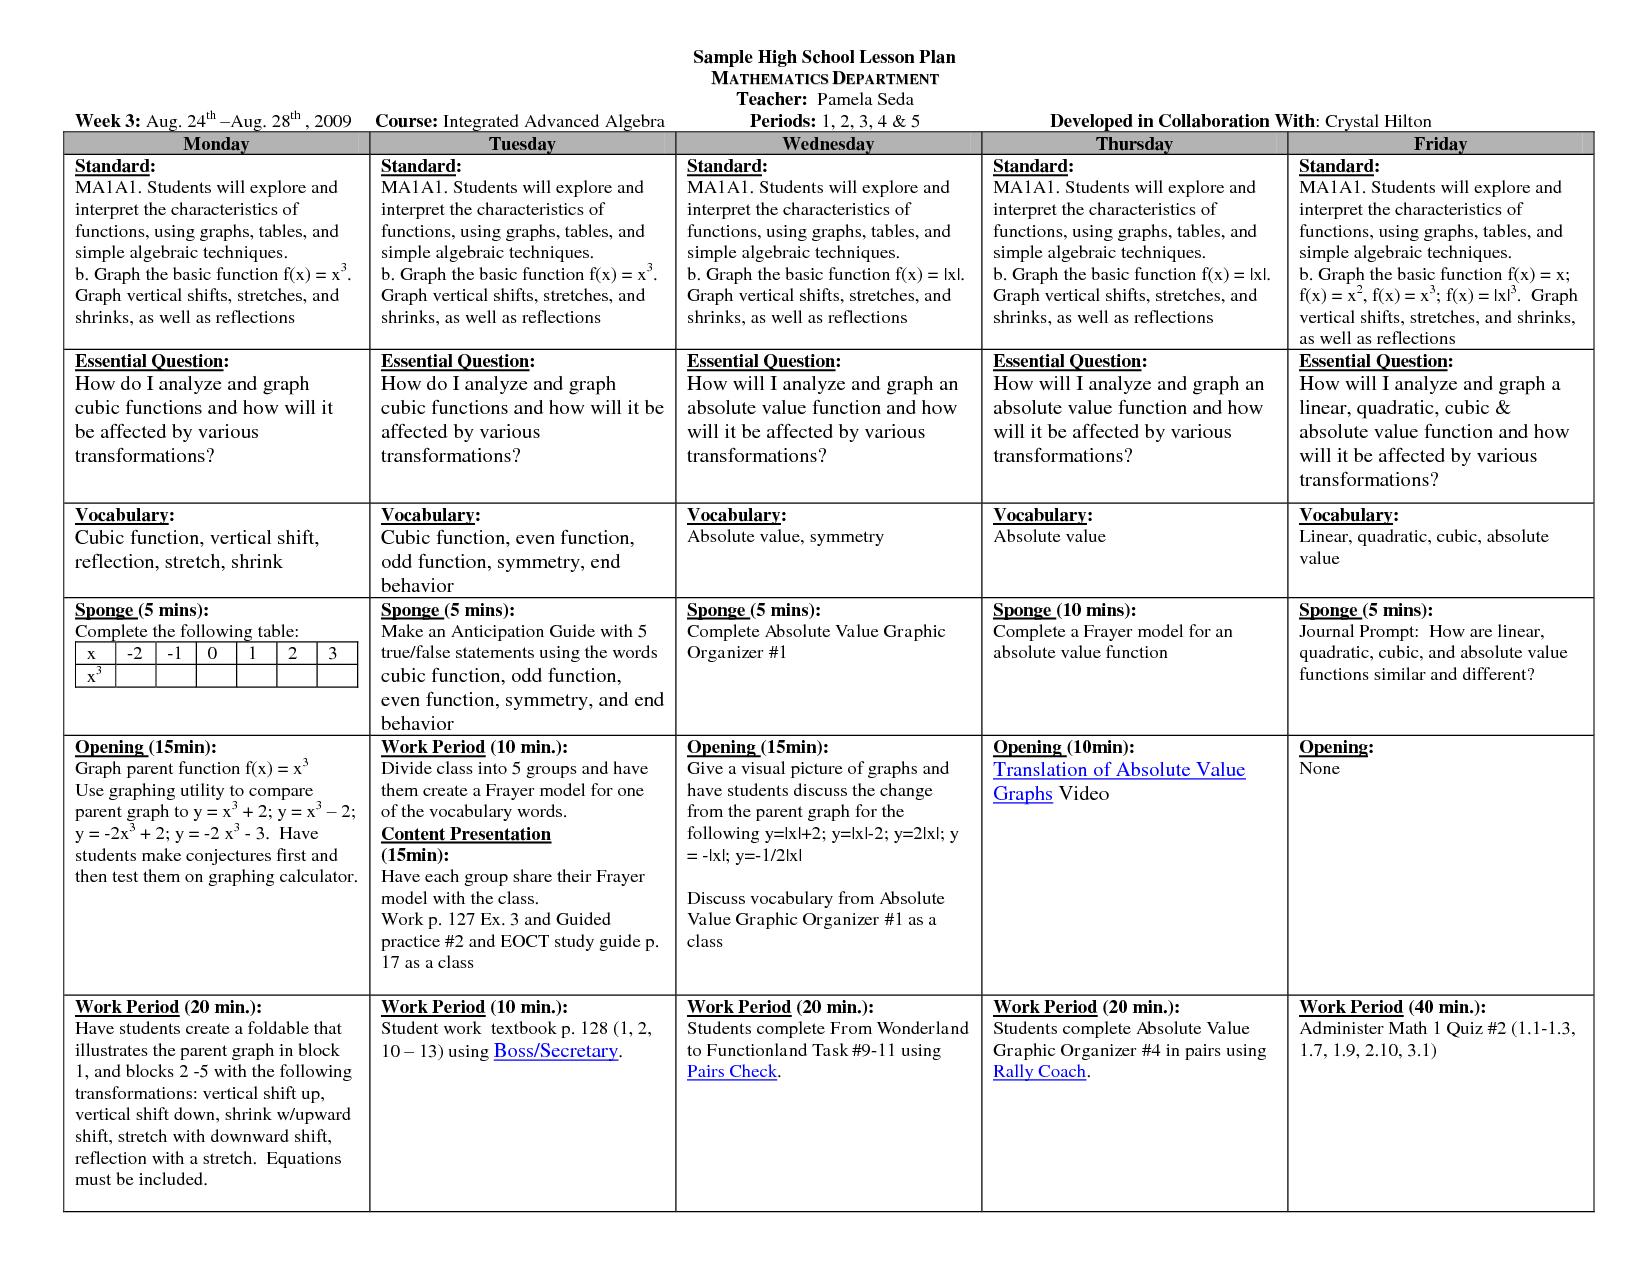 High School English Template # 1   Teacherplanet.com